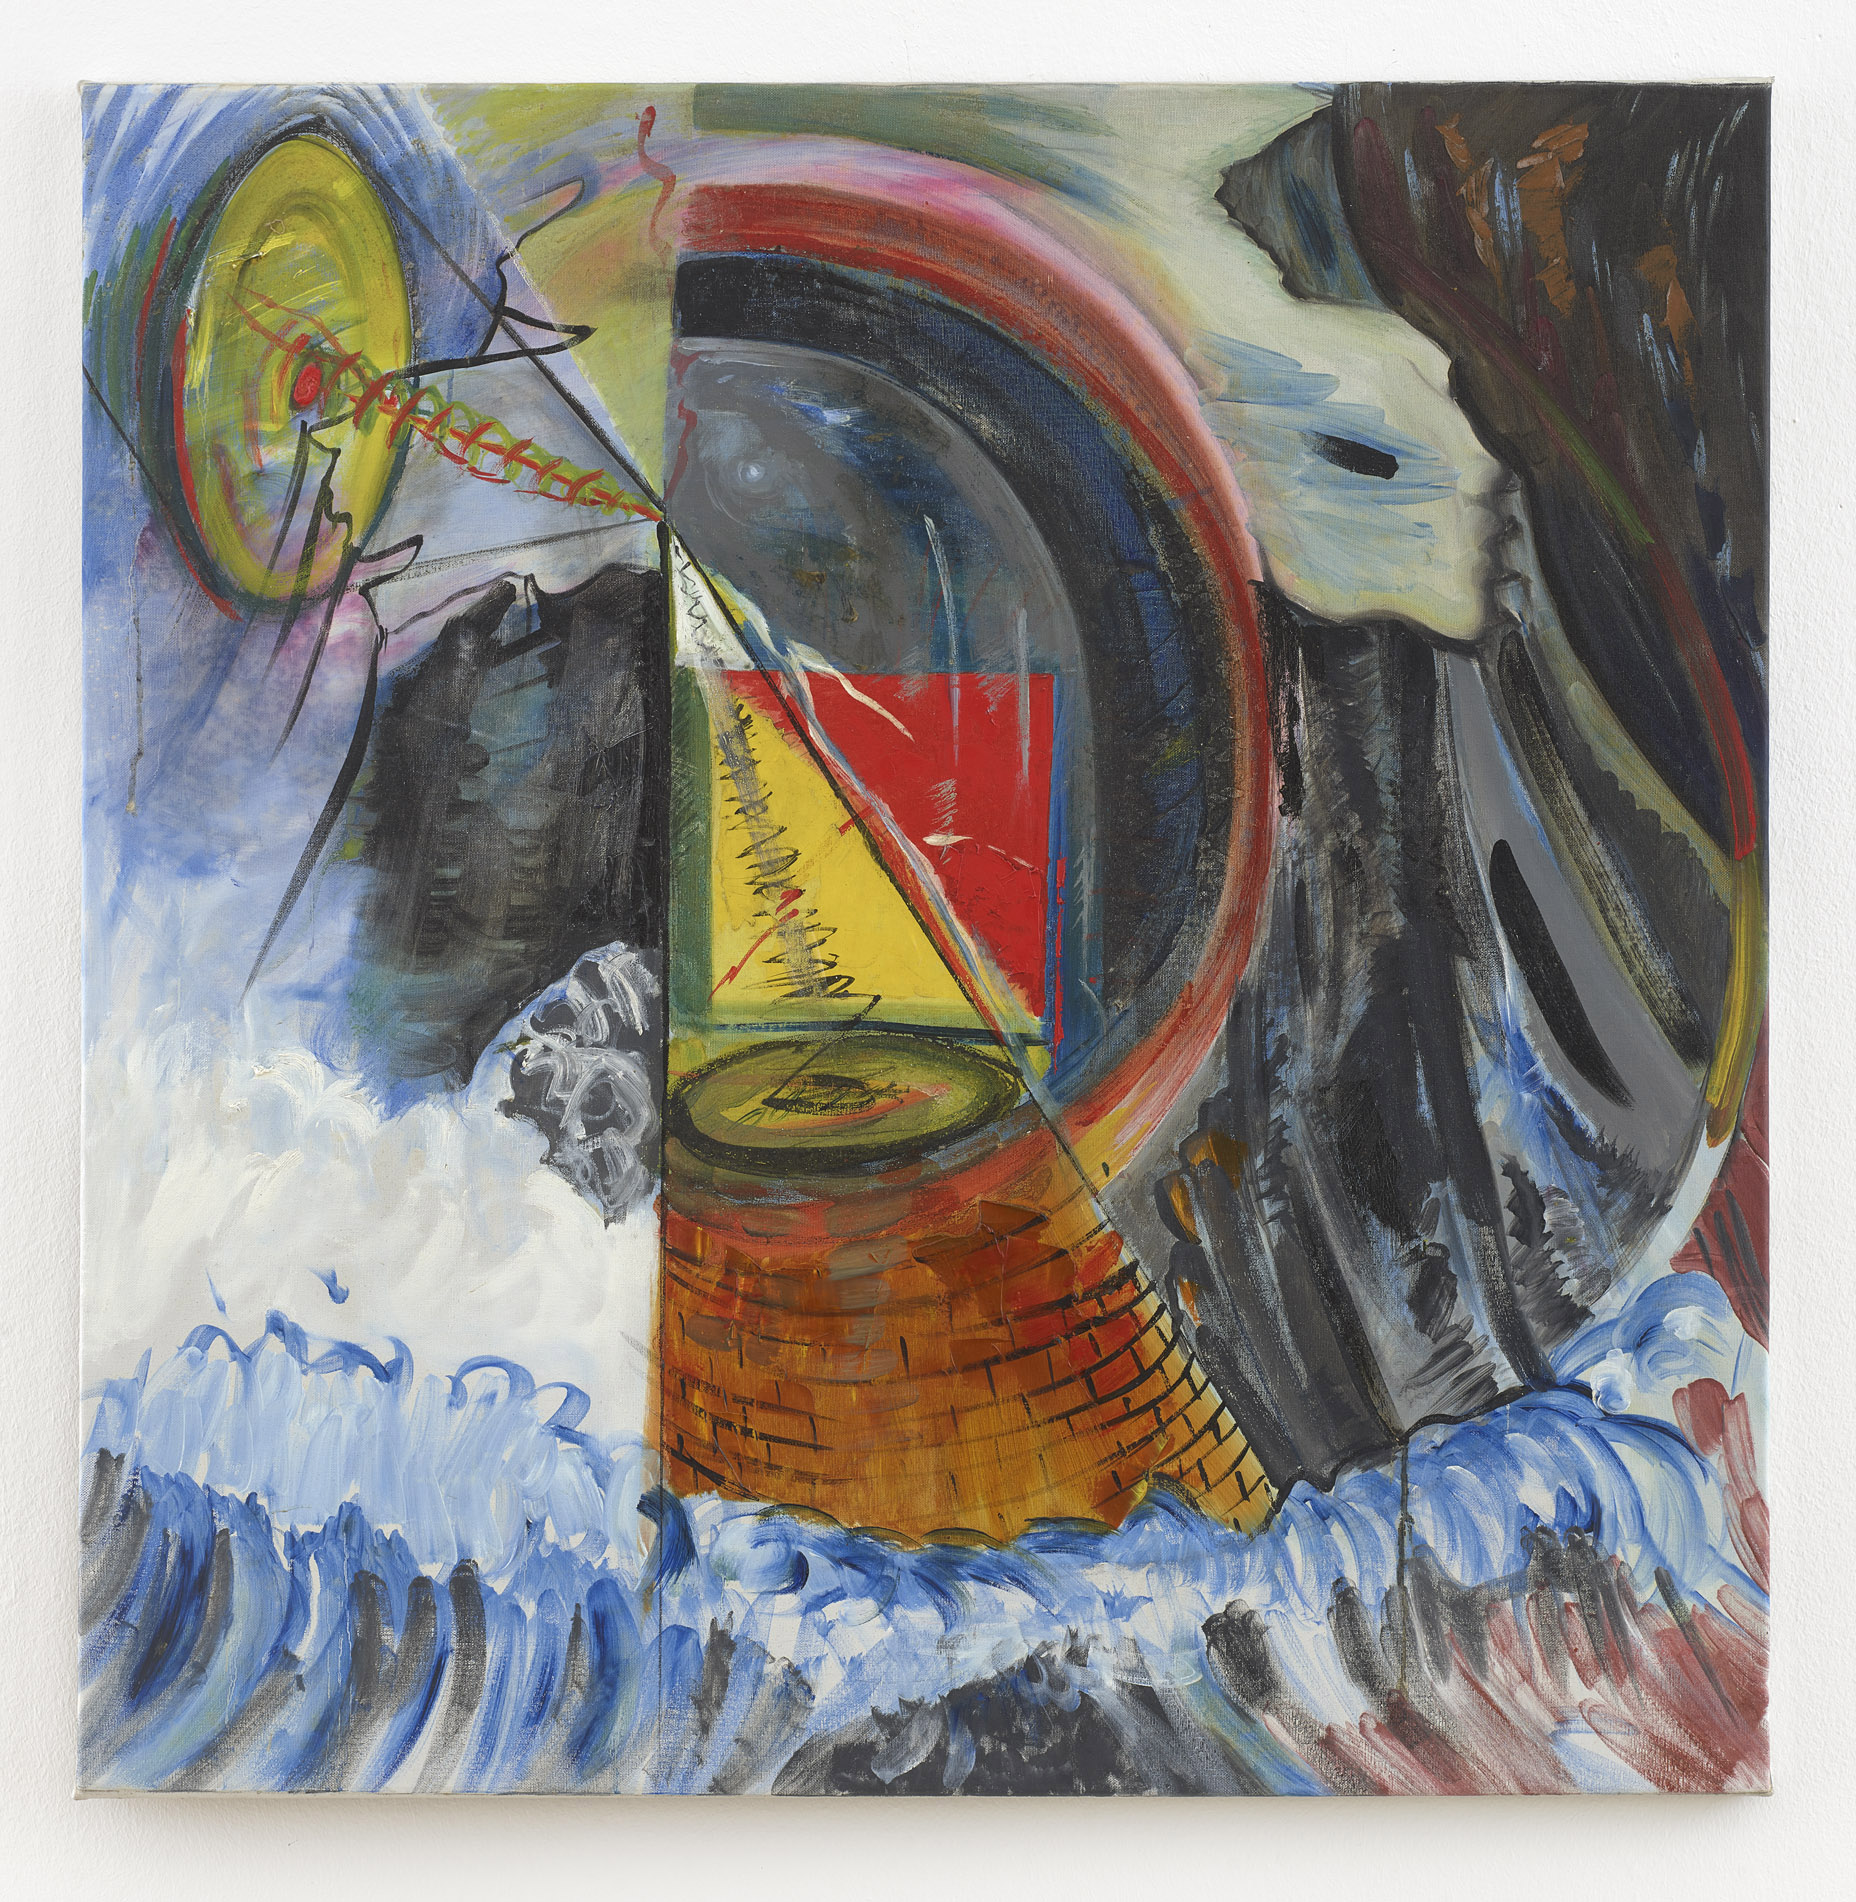 o.T. | undatiert | Acryl auf Leinwand | 102 x 100 cm